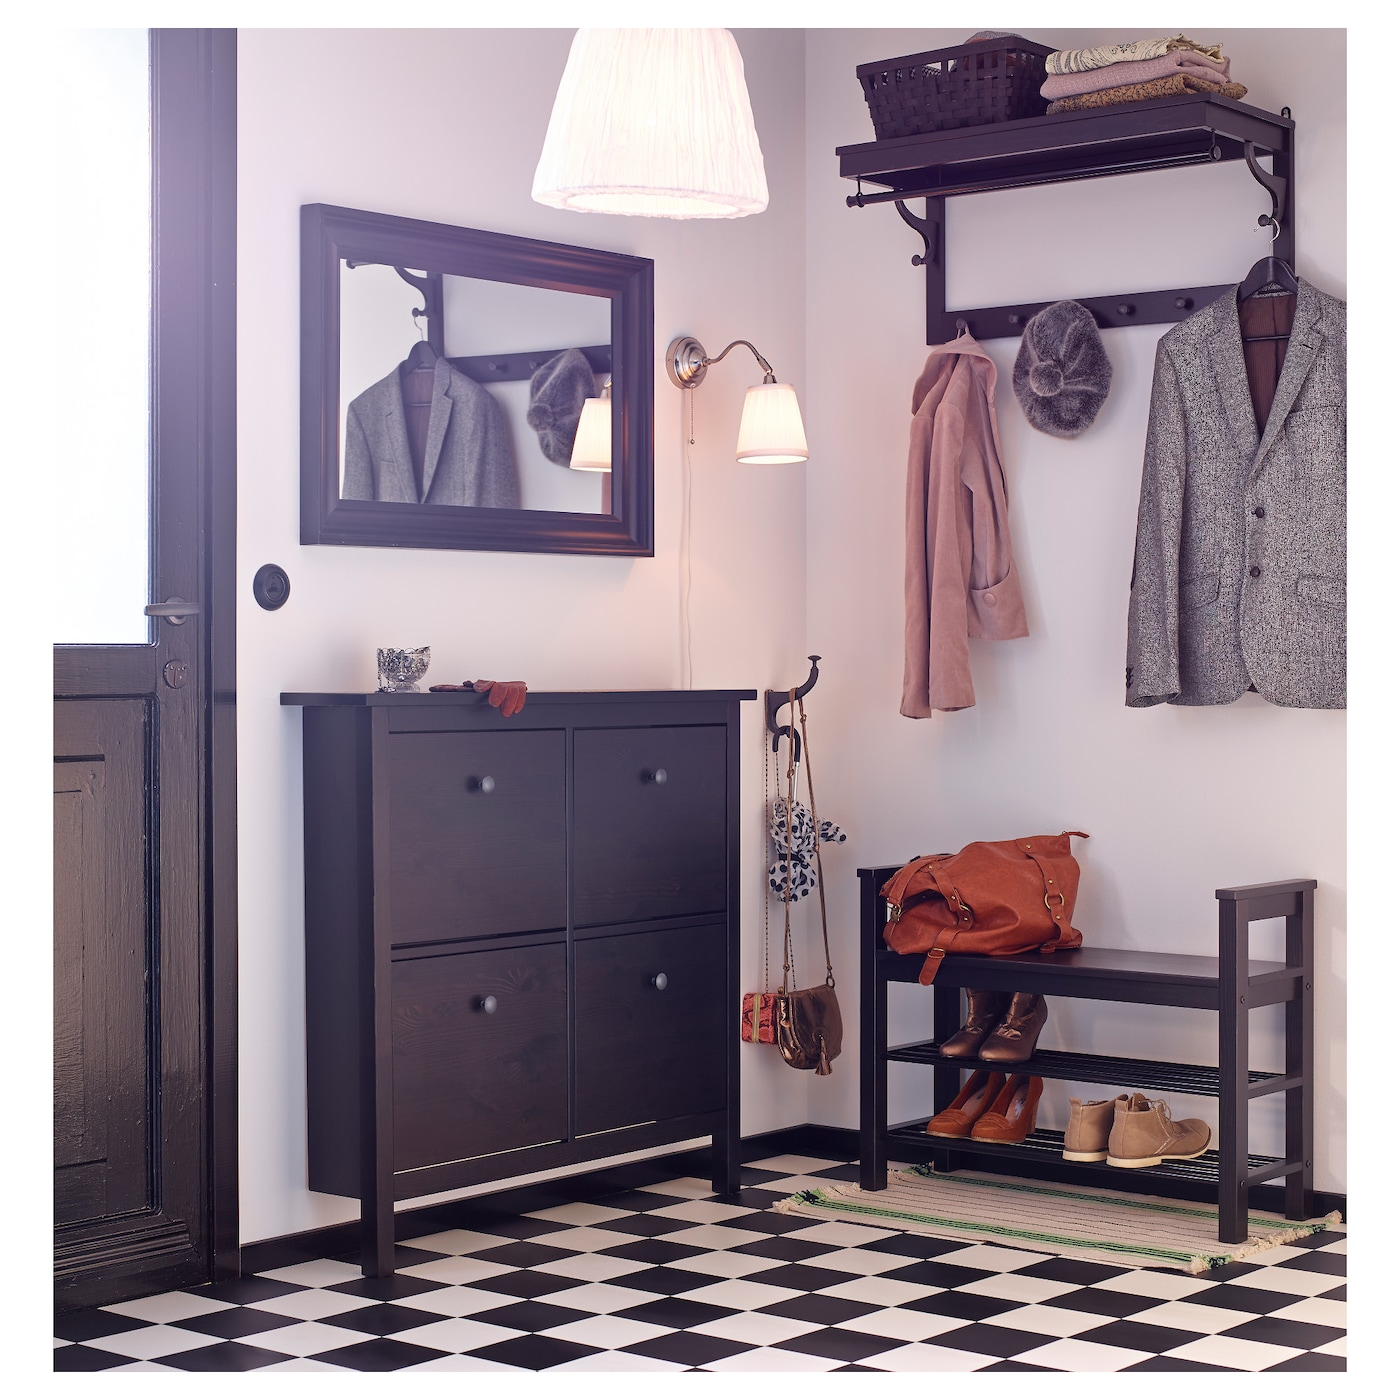 hemnes mirror black brown 60x90 cm ikea. Black Bedroom Furniture Sets. Home Design Ideas